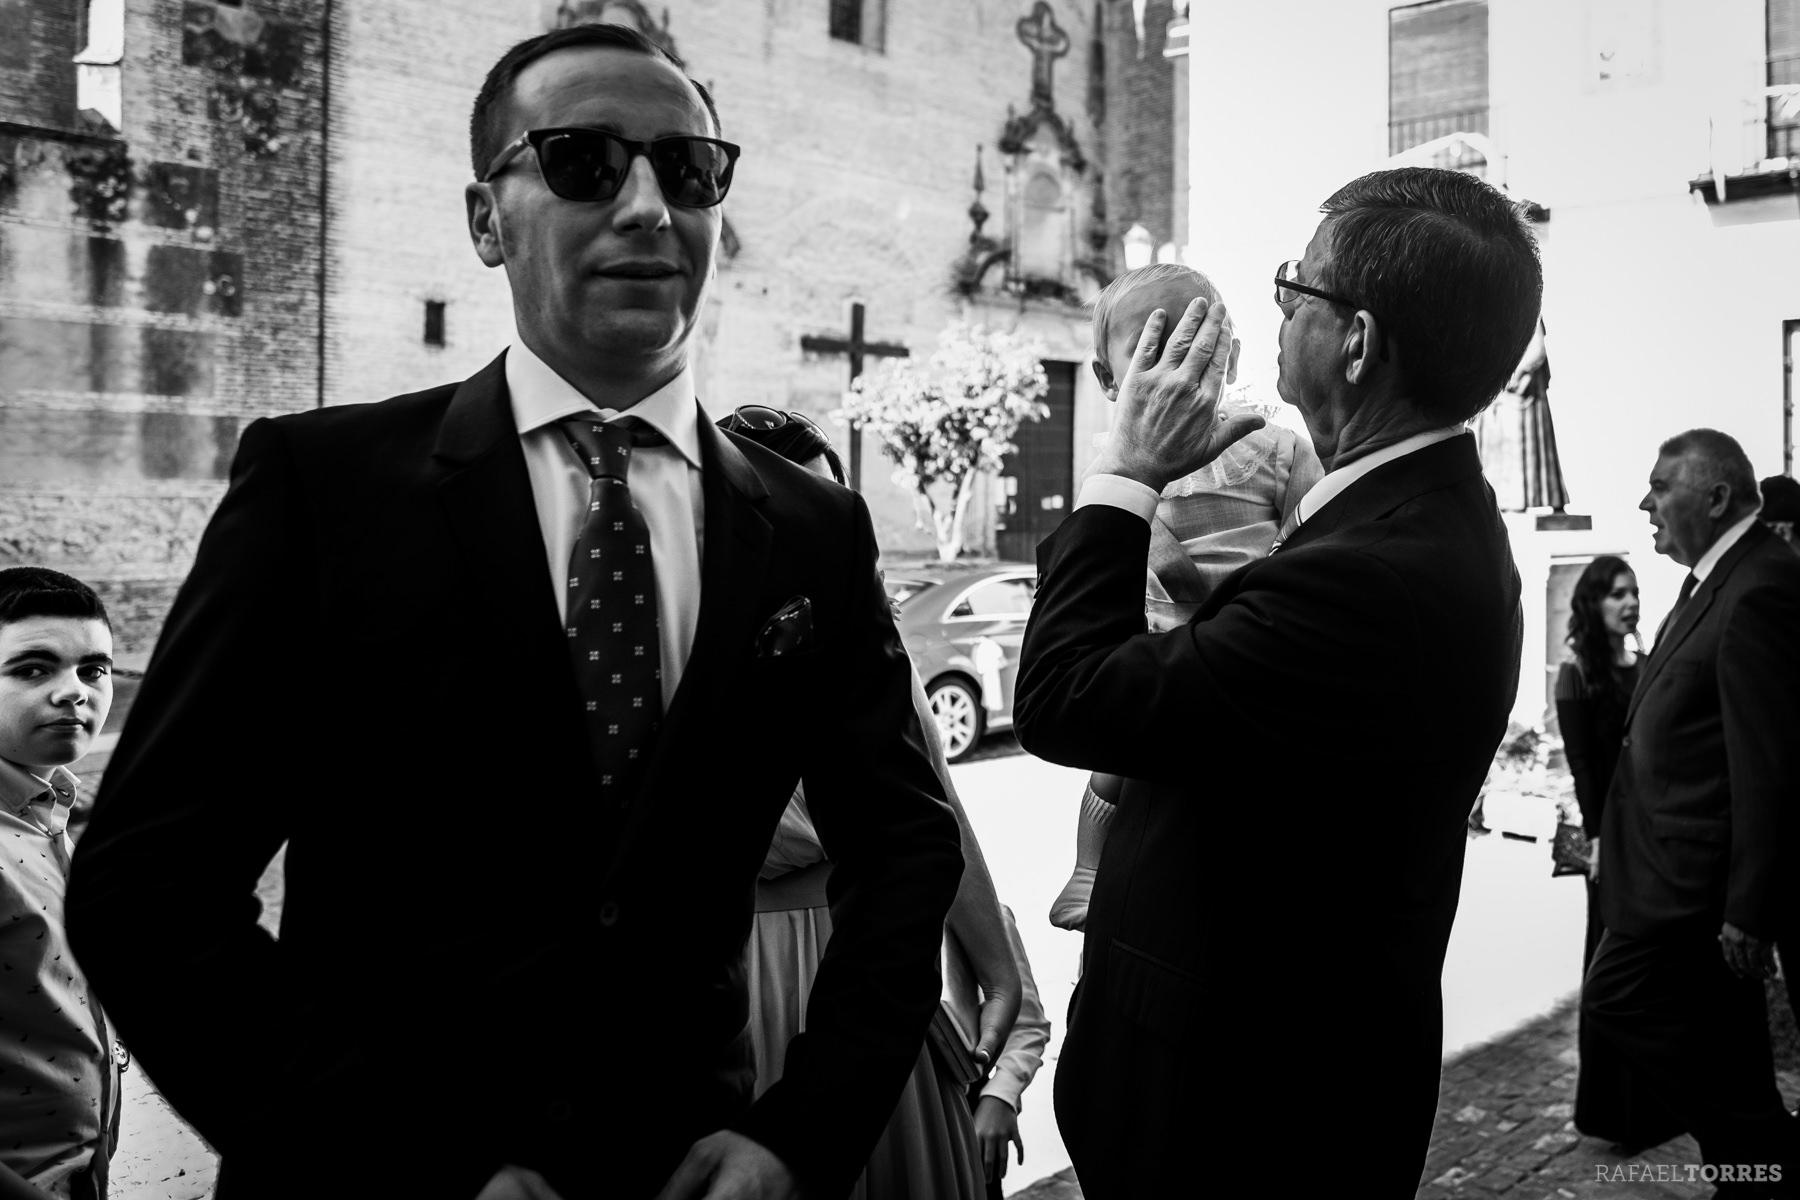 bea-juan-carmona-fotografo-boda-en-sevilla-rafael-torres-photo-27.jpg